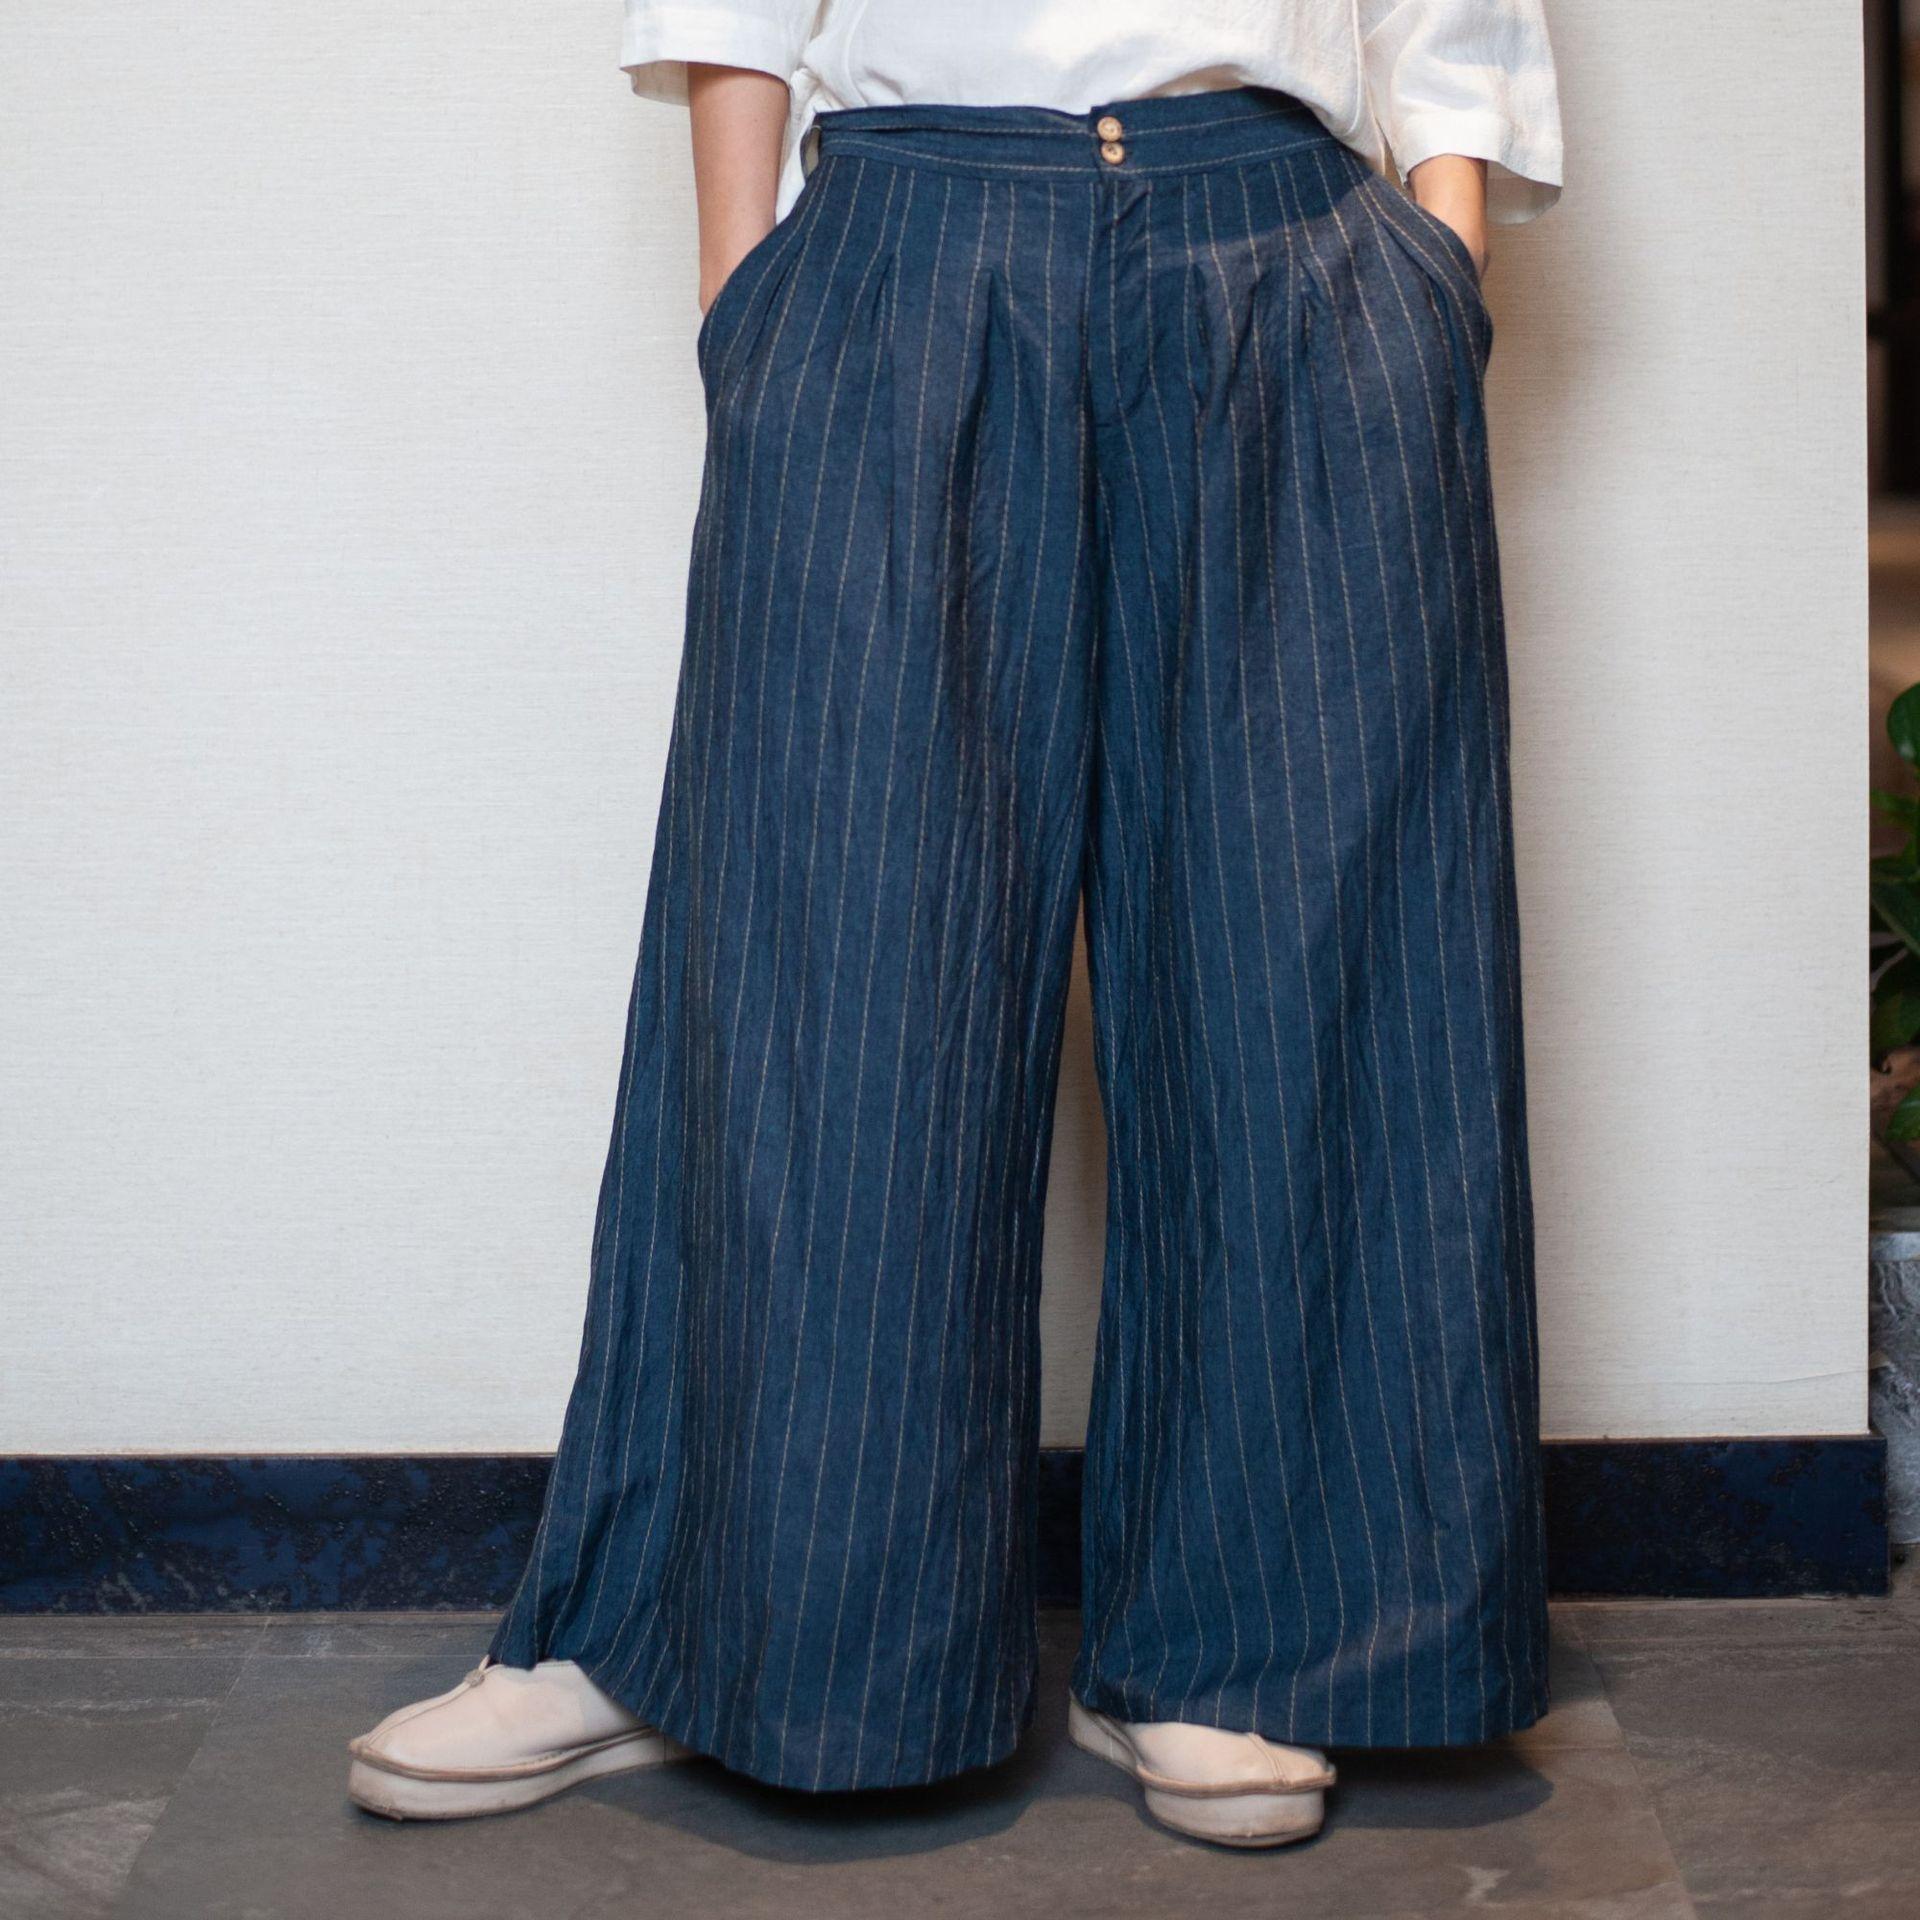 Original Chinese Style Women's Trousers Retro Stripe Casual Wide Leg Pants Navy Blue